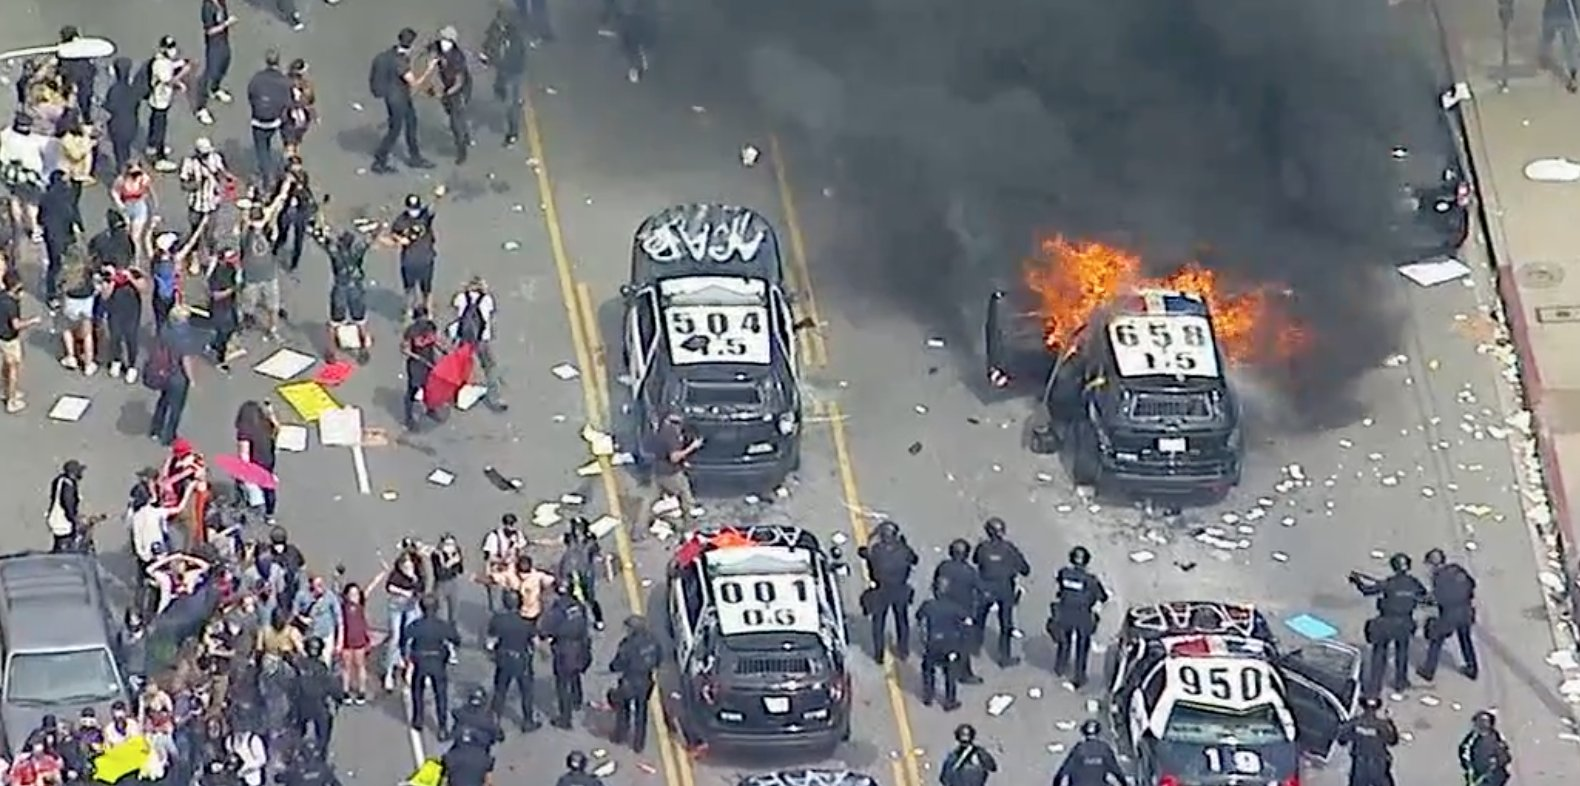 https://www.entertane.com/wp-content/uploads/2020/05/LA_Riots.jpeg